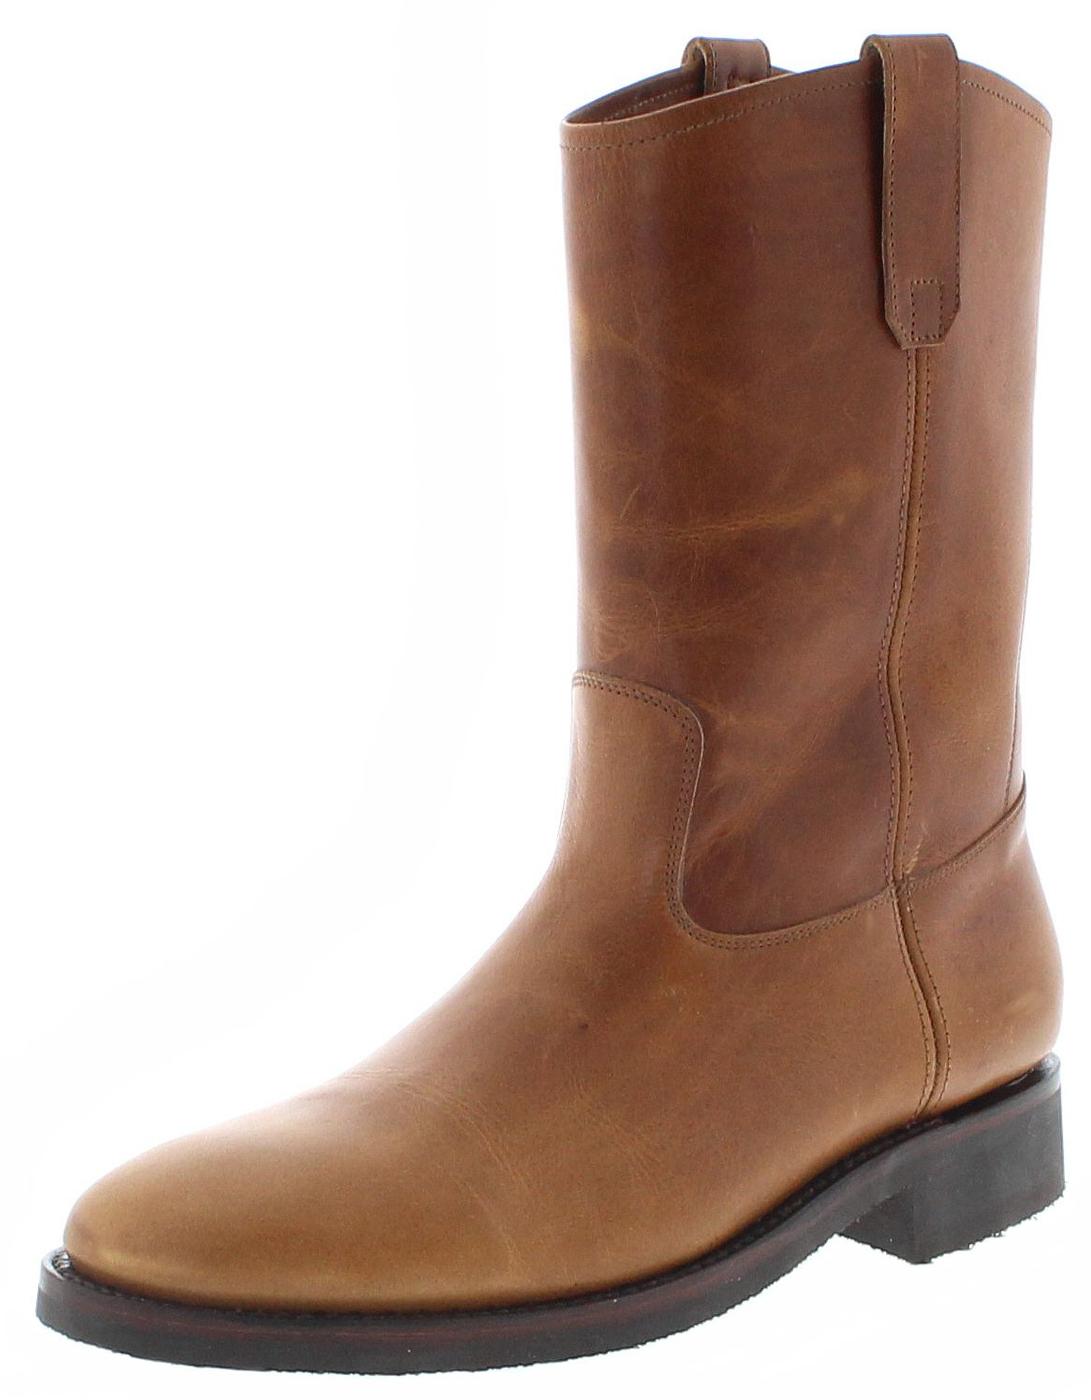 Sendra Boots 14968 Evolution Tang Lederstiefel mit Gummisohle - braun